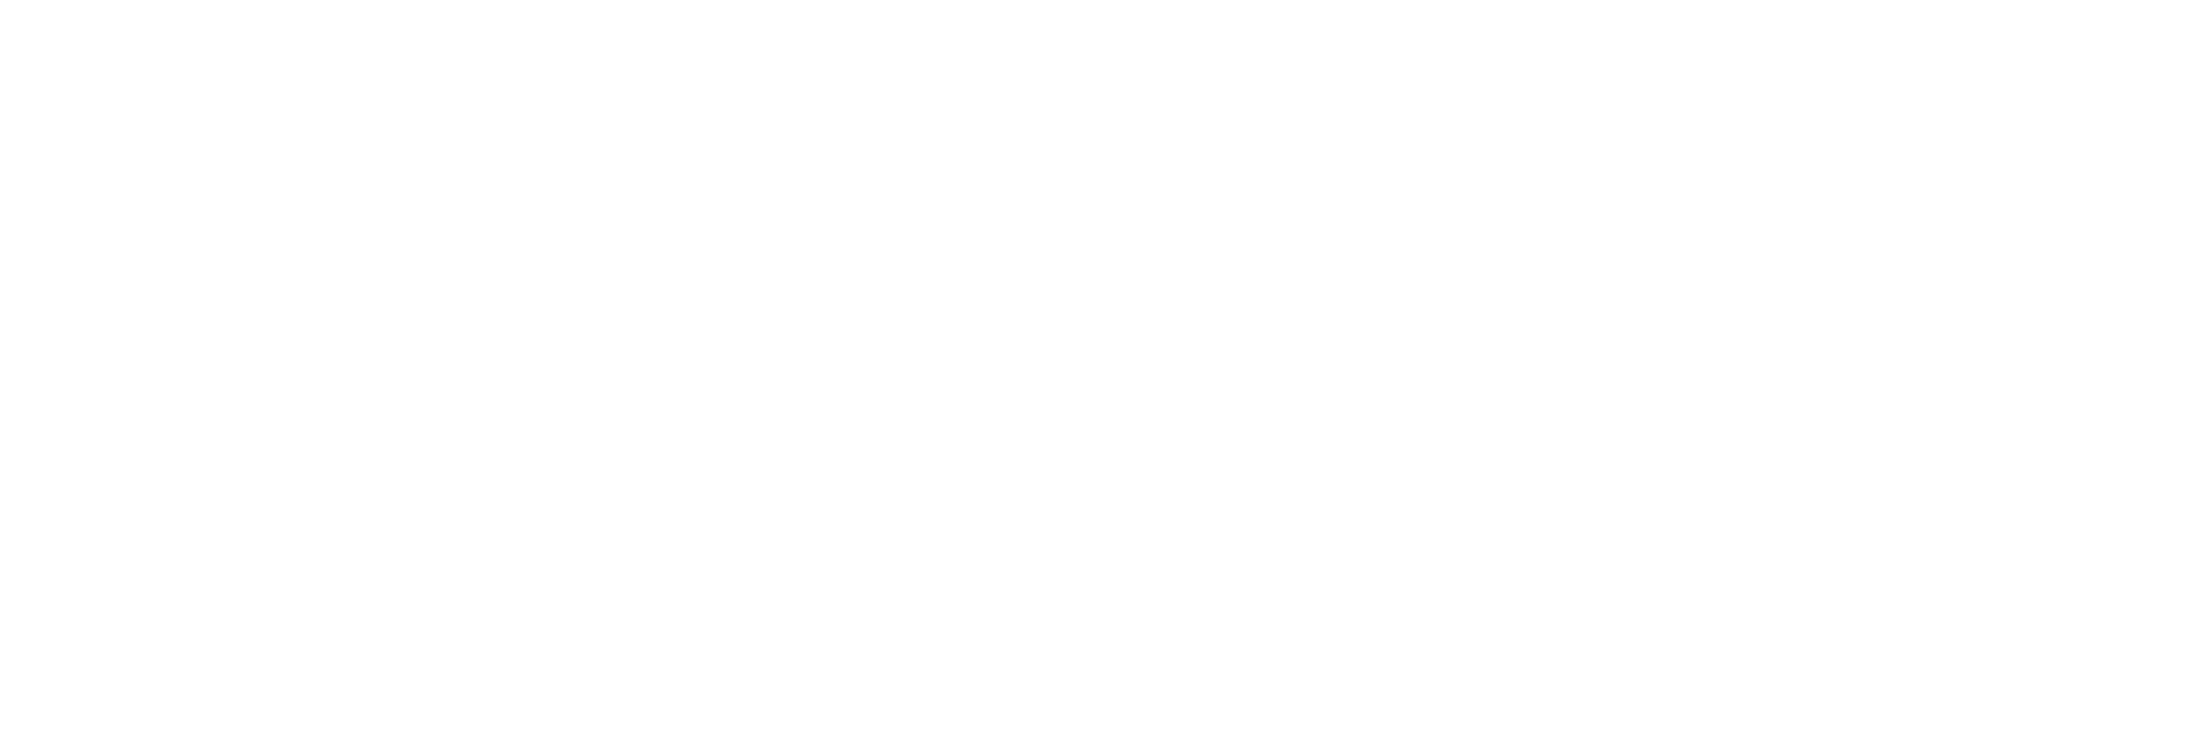 granger_w.png